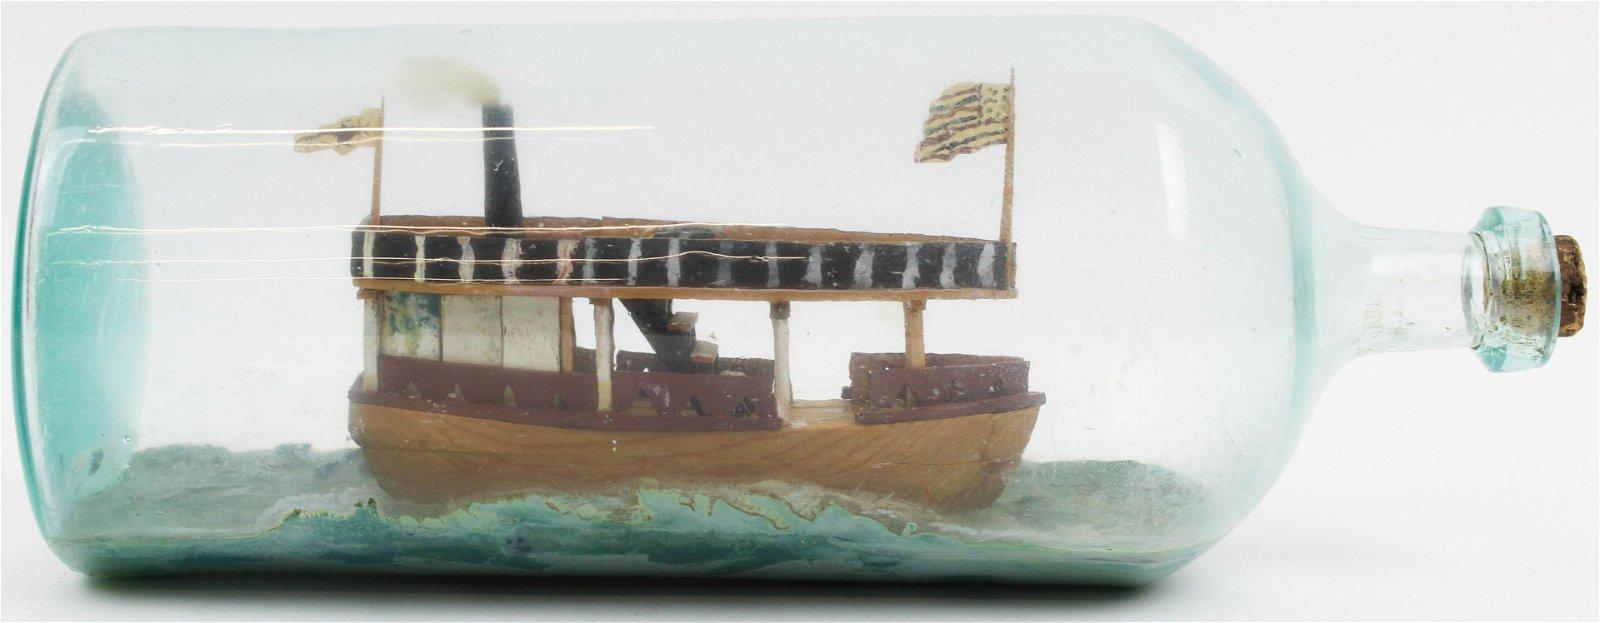 Adirondack/ Lake Champlain Ship in a Bottle